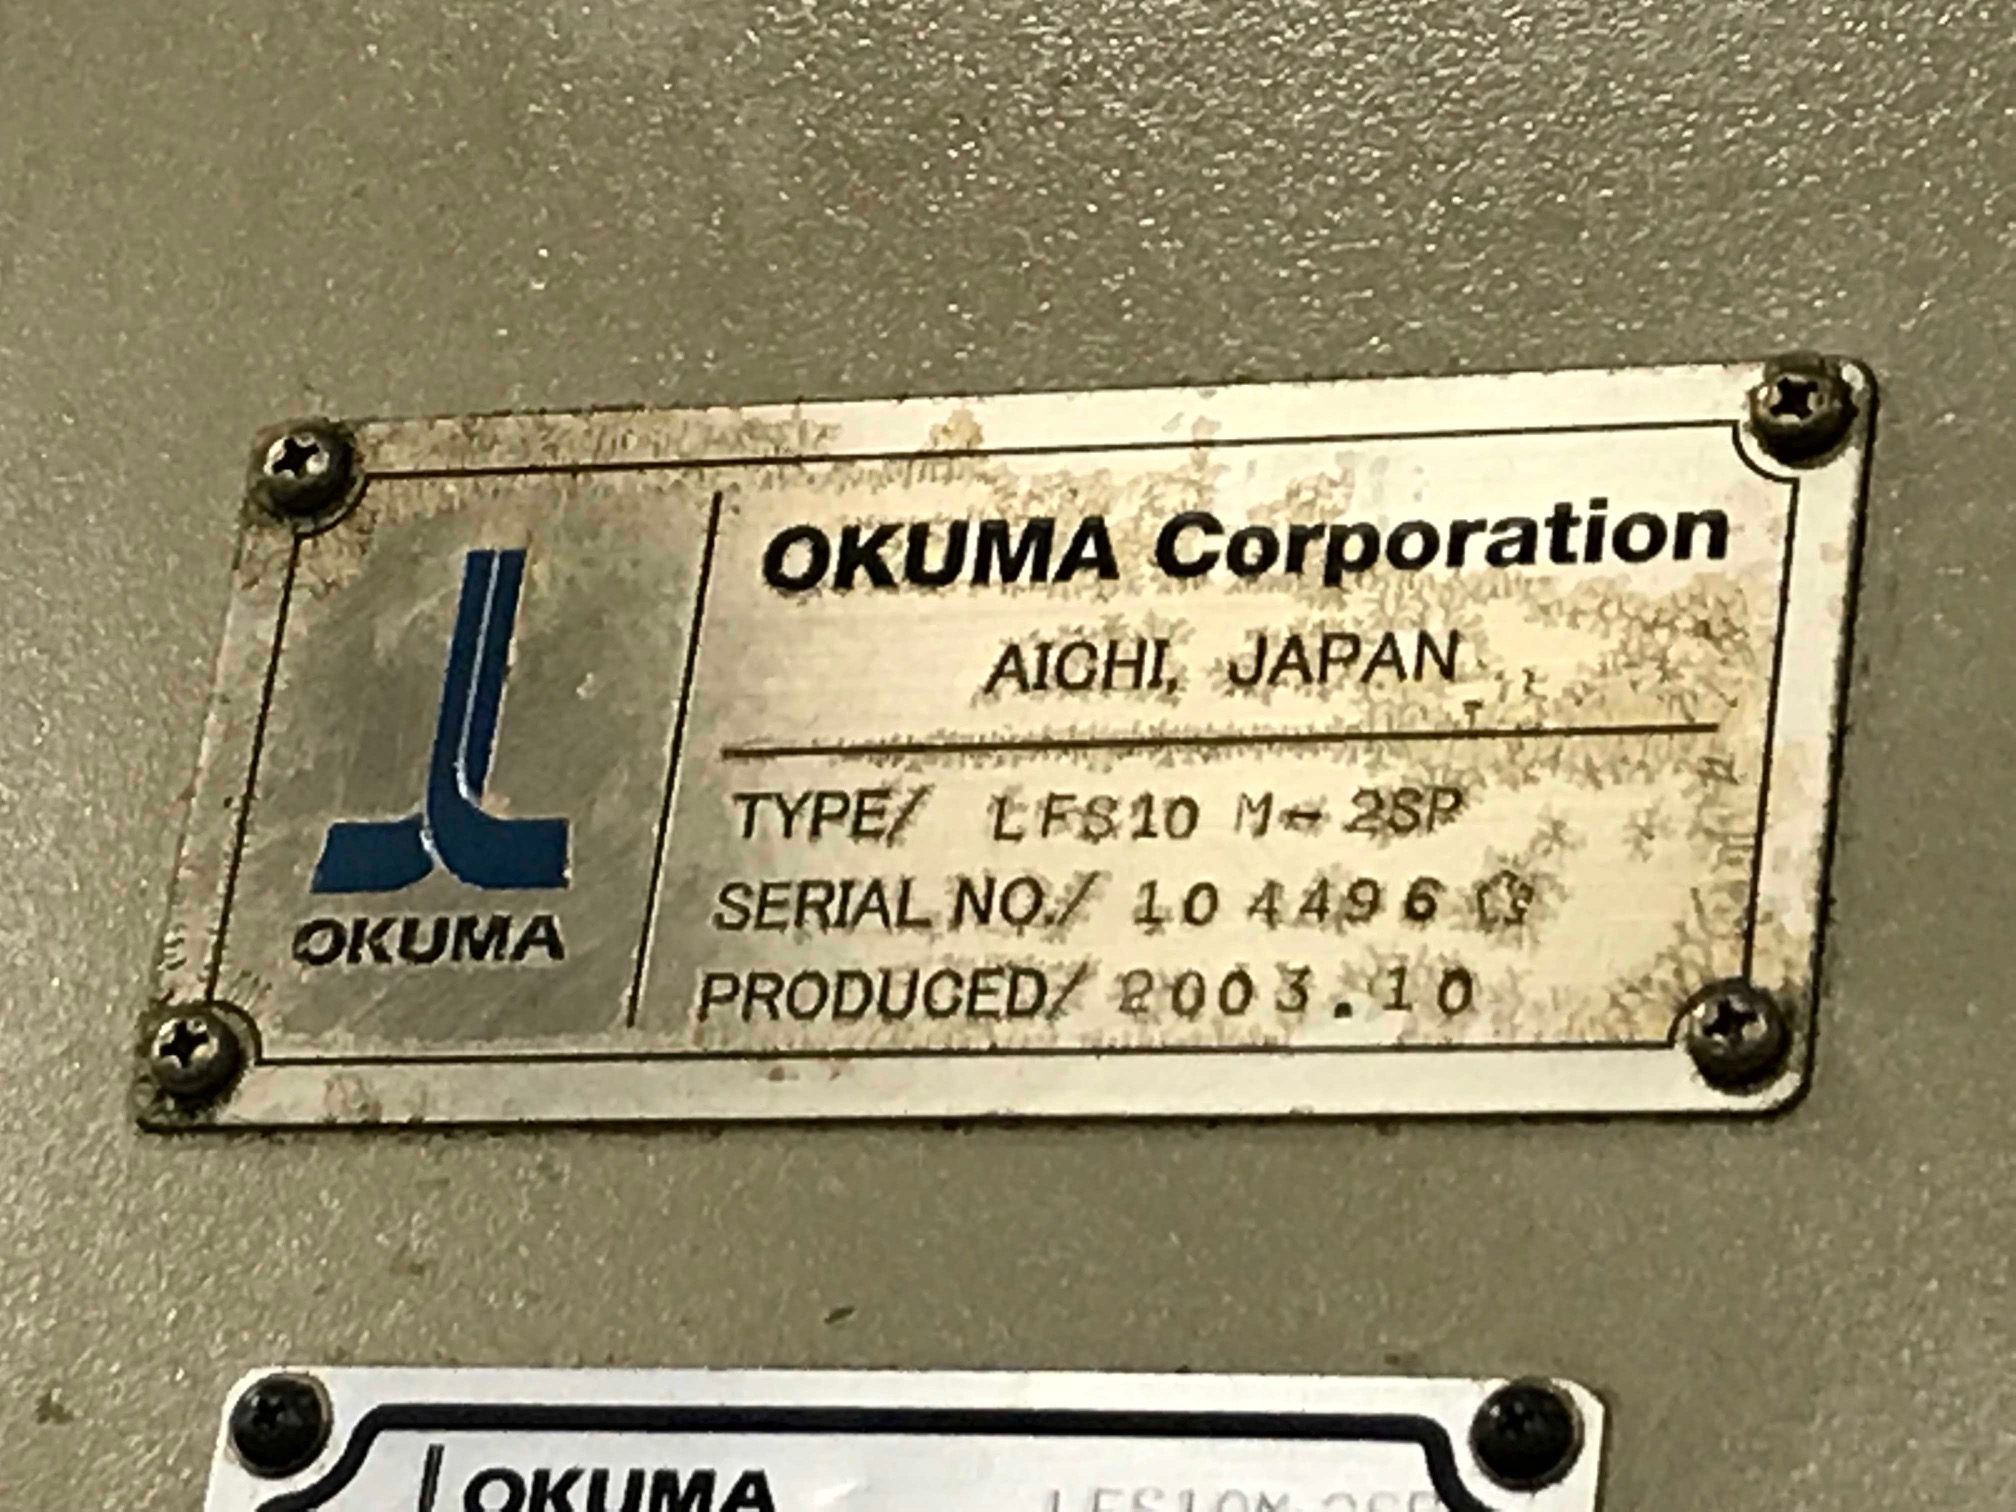 Lot 6 - OKUMA LFS10 M-2SP TWIN SPINDLE CNC LATHE WITH MILLING & GANTRY LOADER, YEAR 2003, SN 104496, LOC. IL